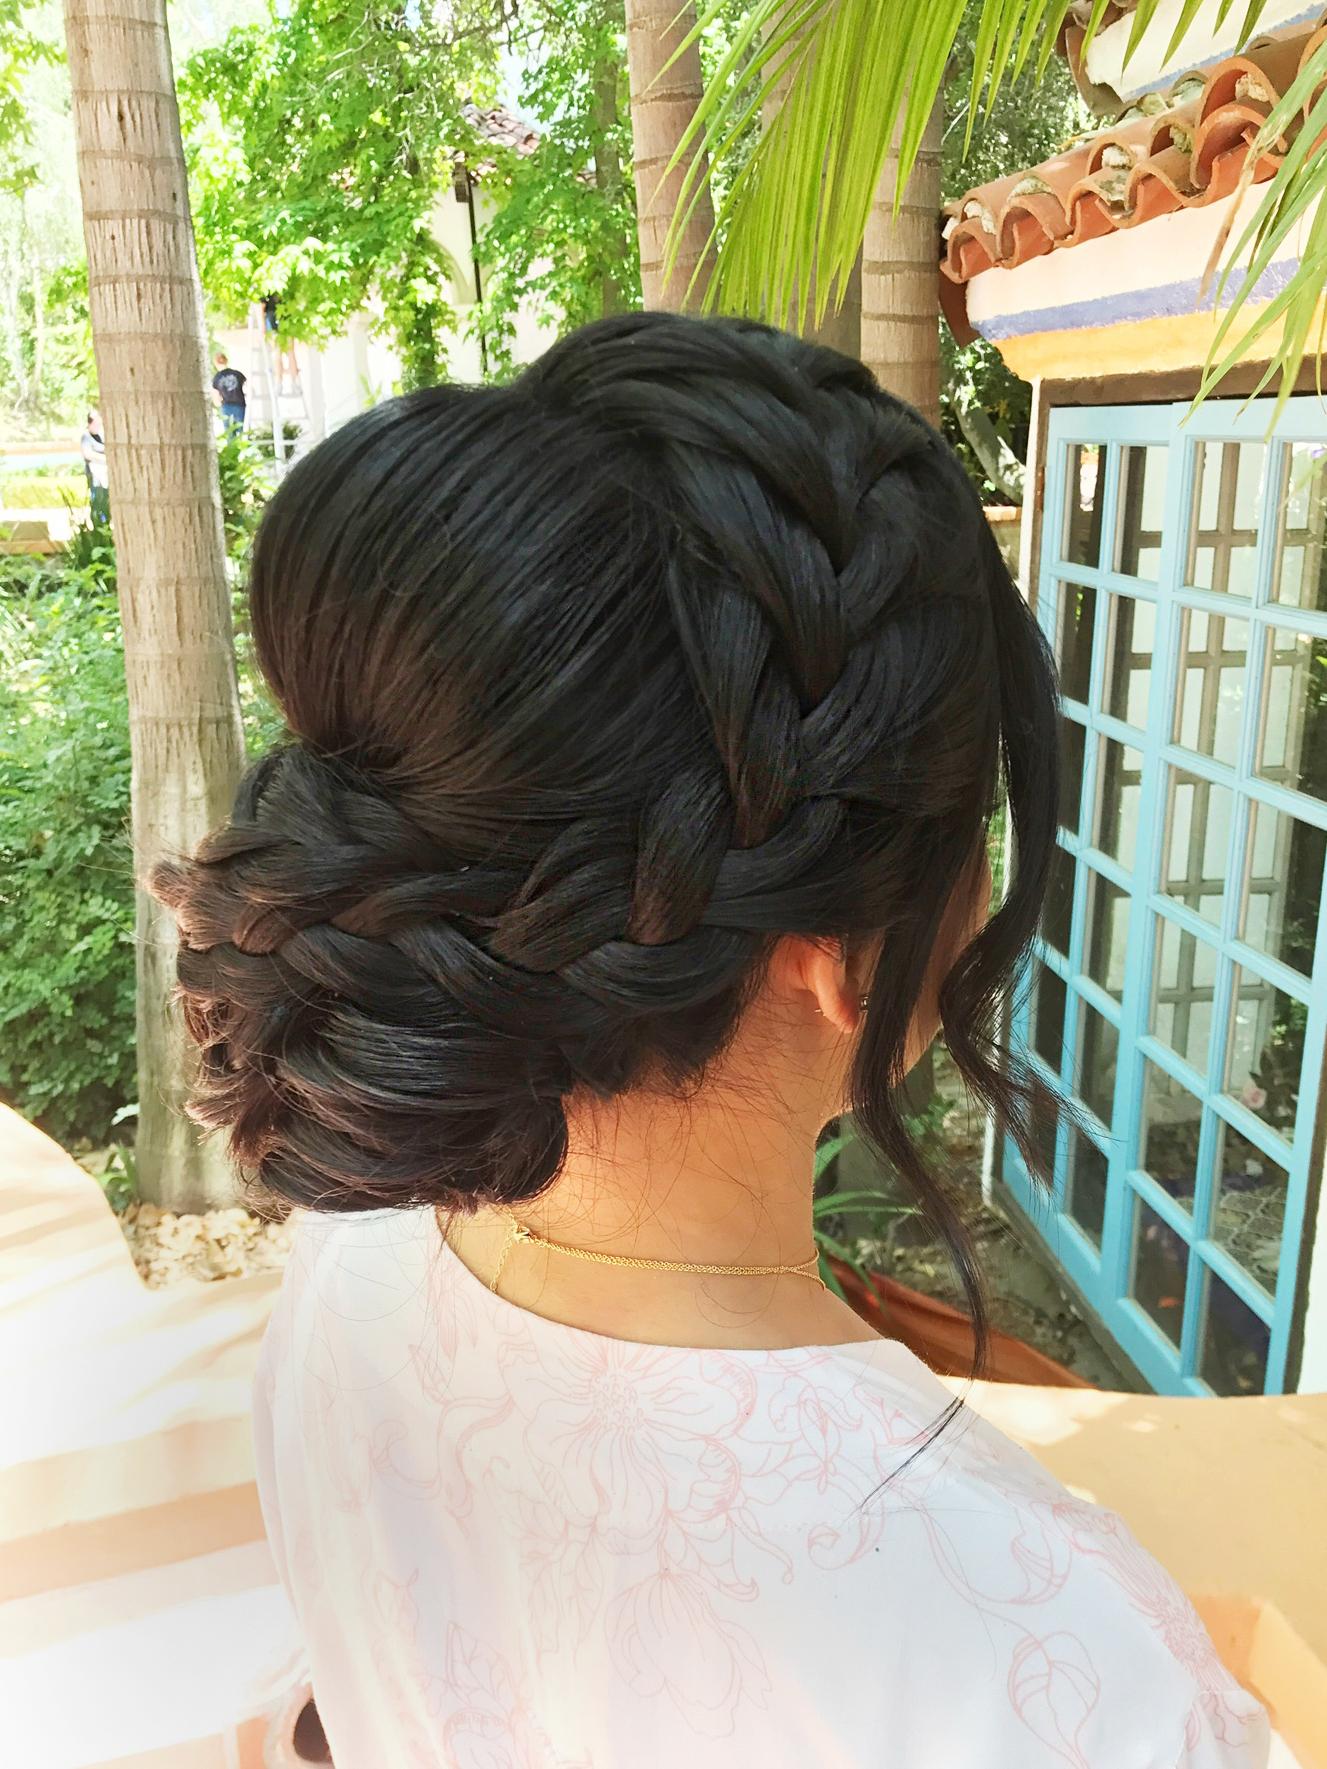 Braid updo hairstyle low bun beauty affair los angeles.JPG